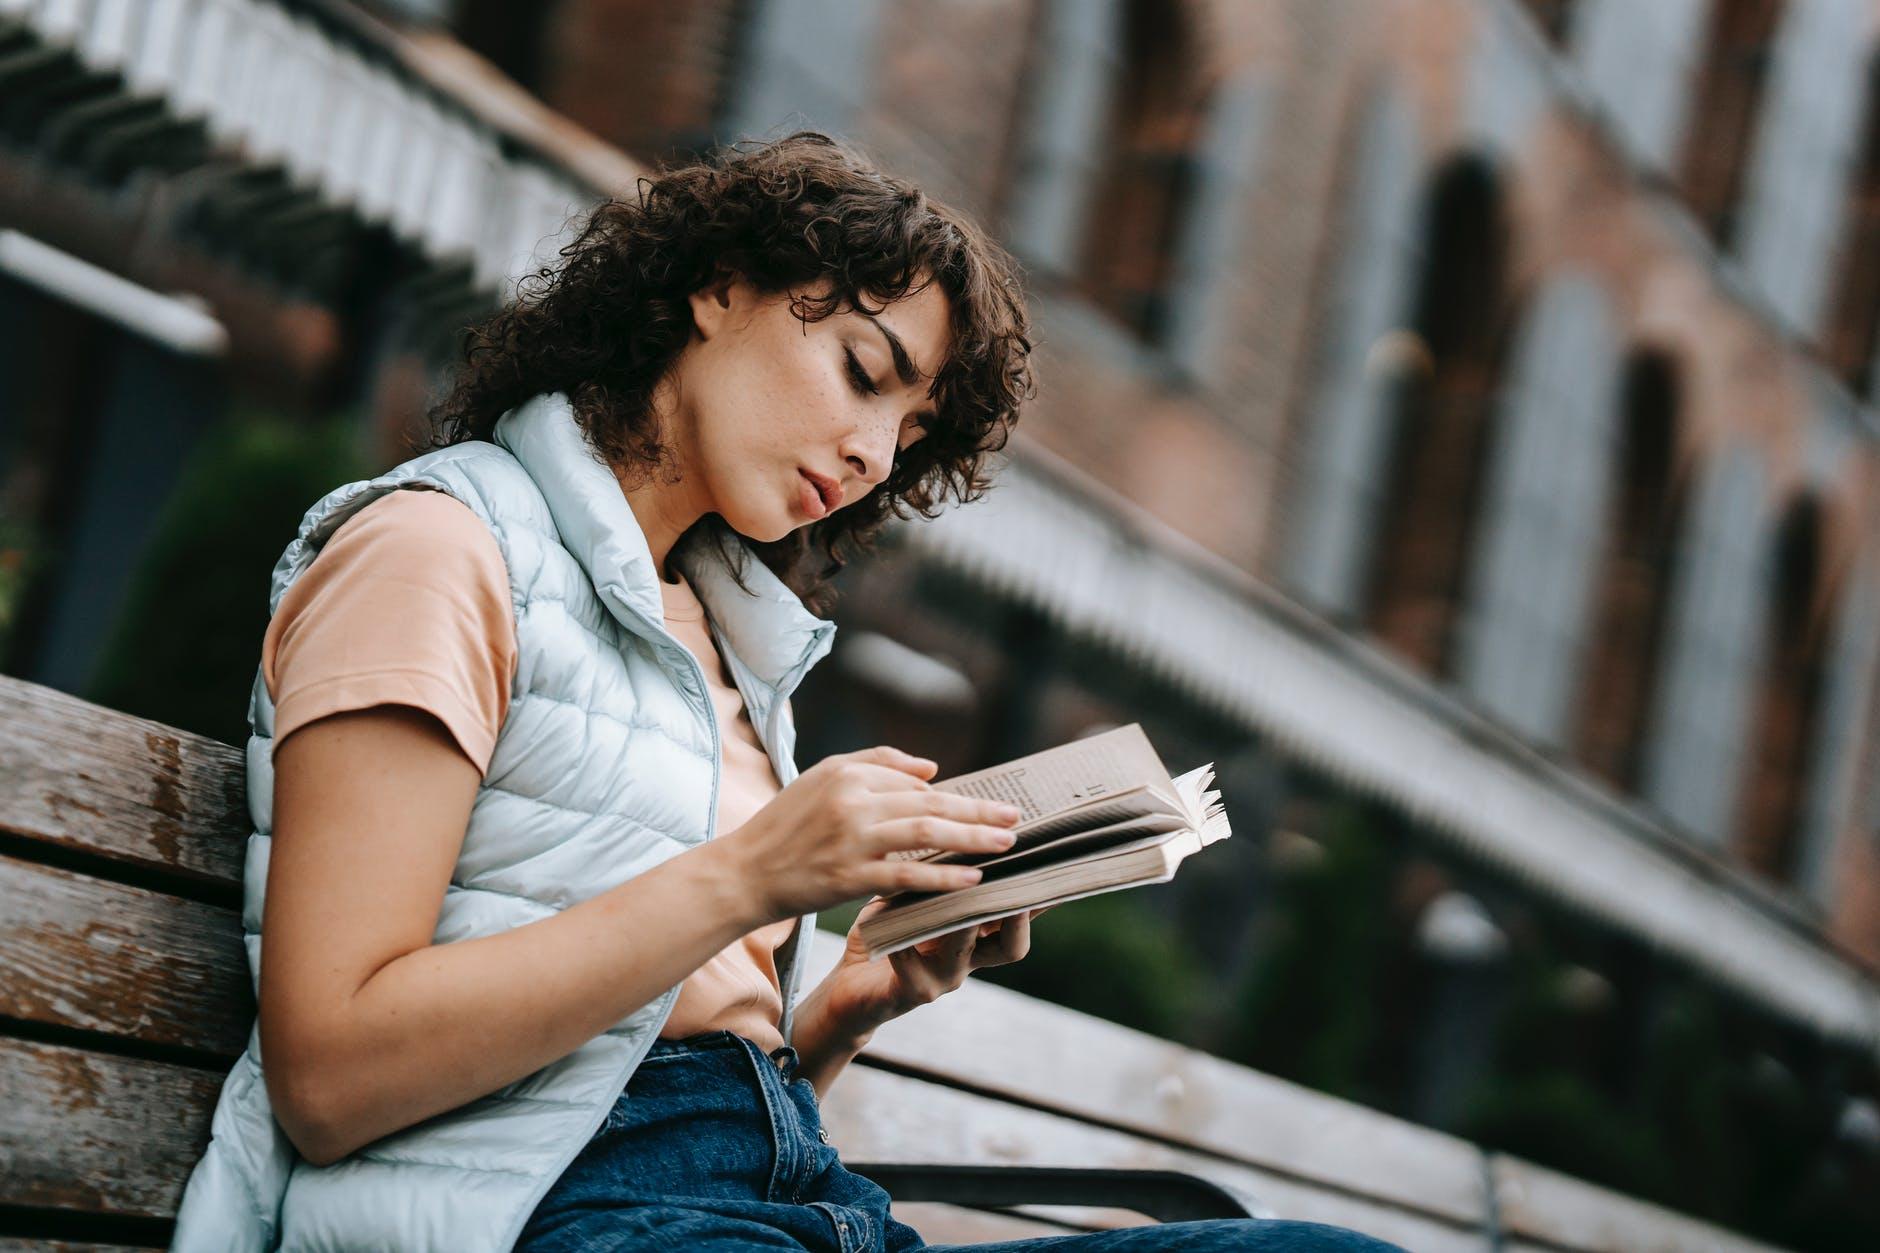 Graphic novels – Popular books for teens